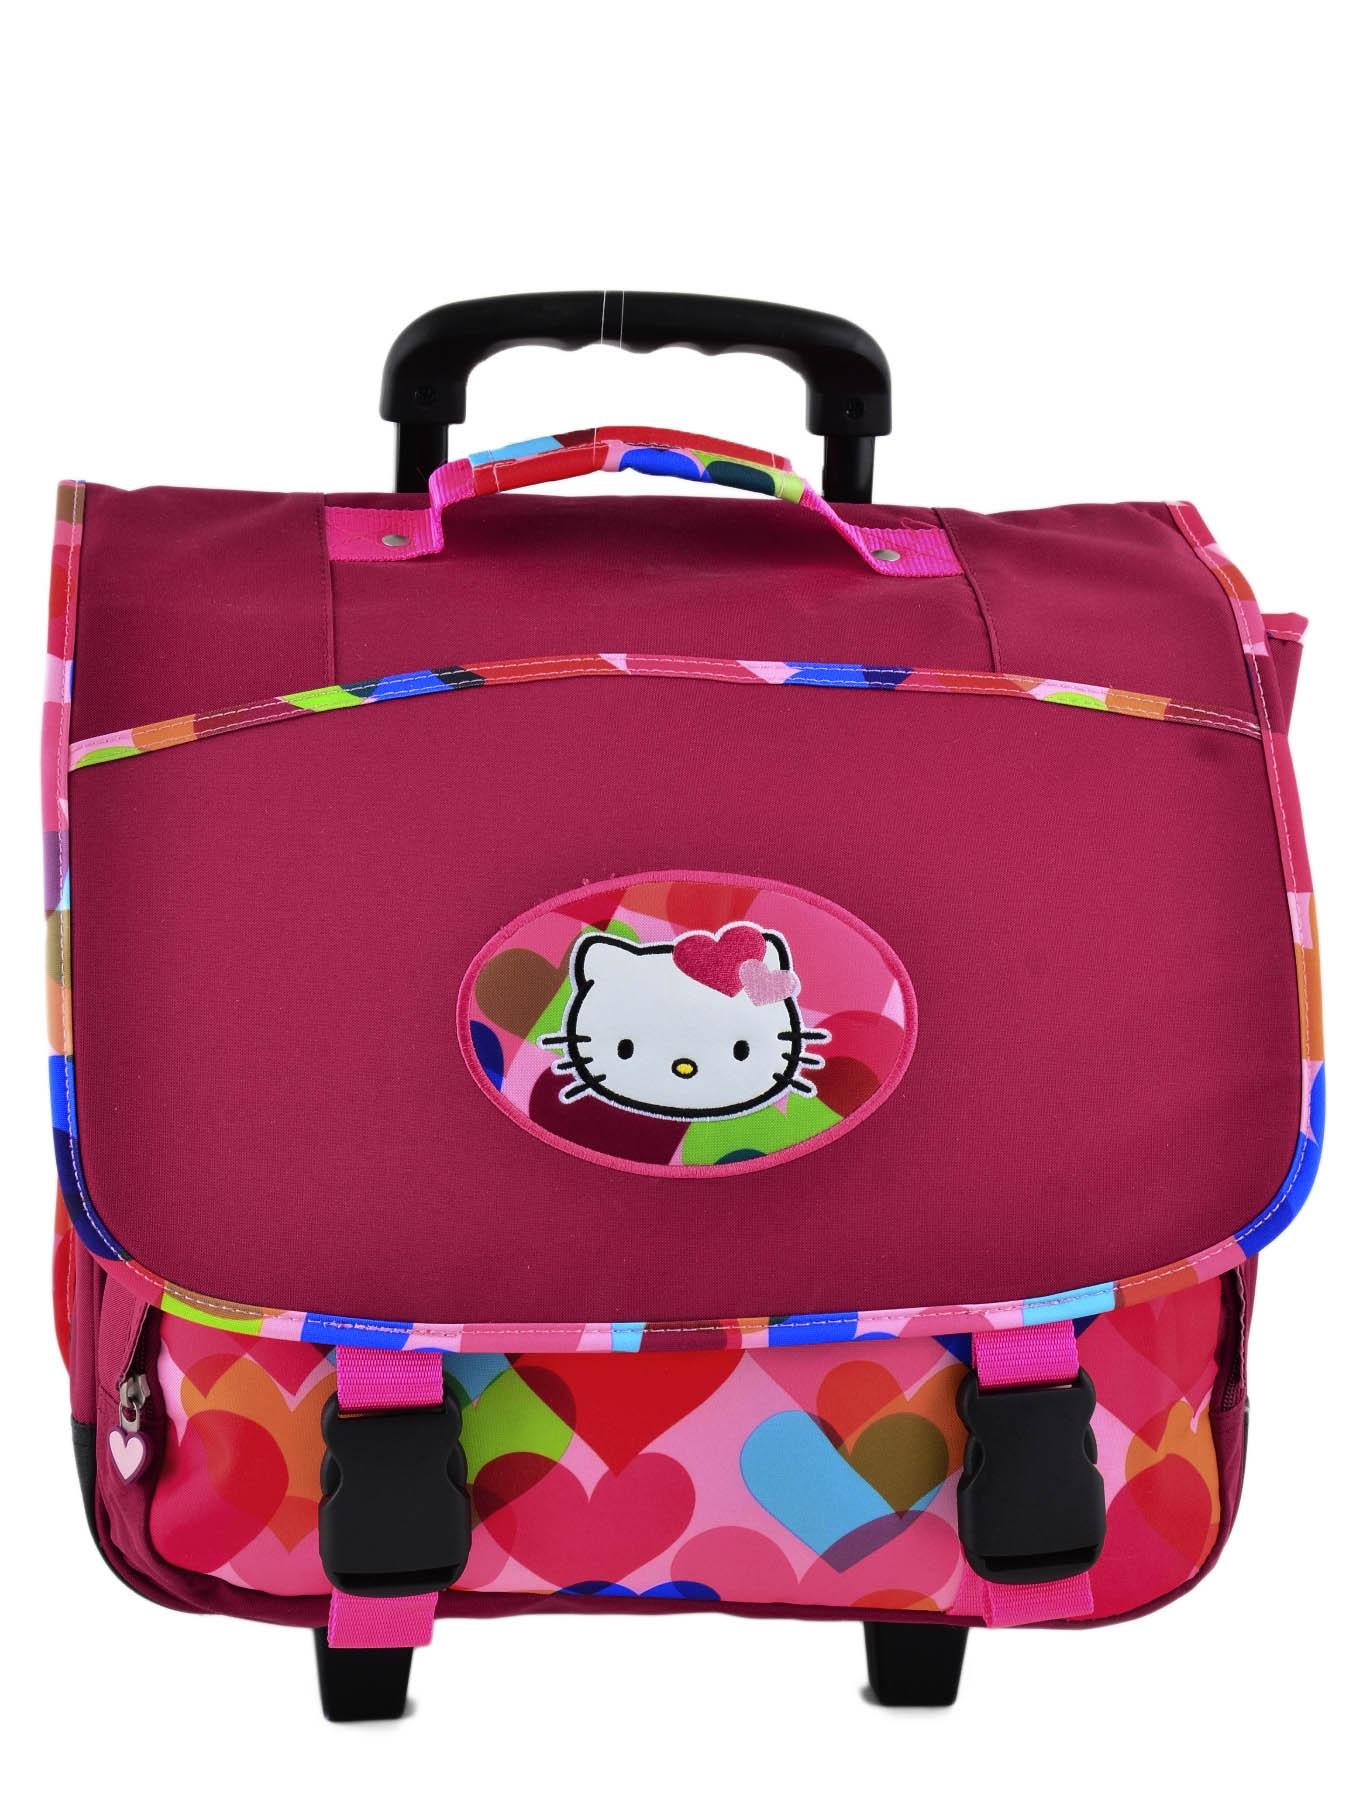 Школьный портфель на колесах Hello Kitty арт. HPS23070R, - фото 2